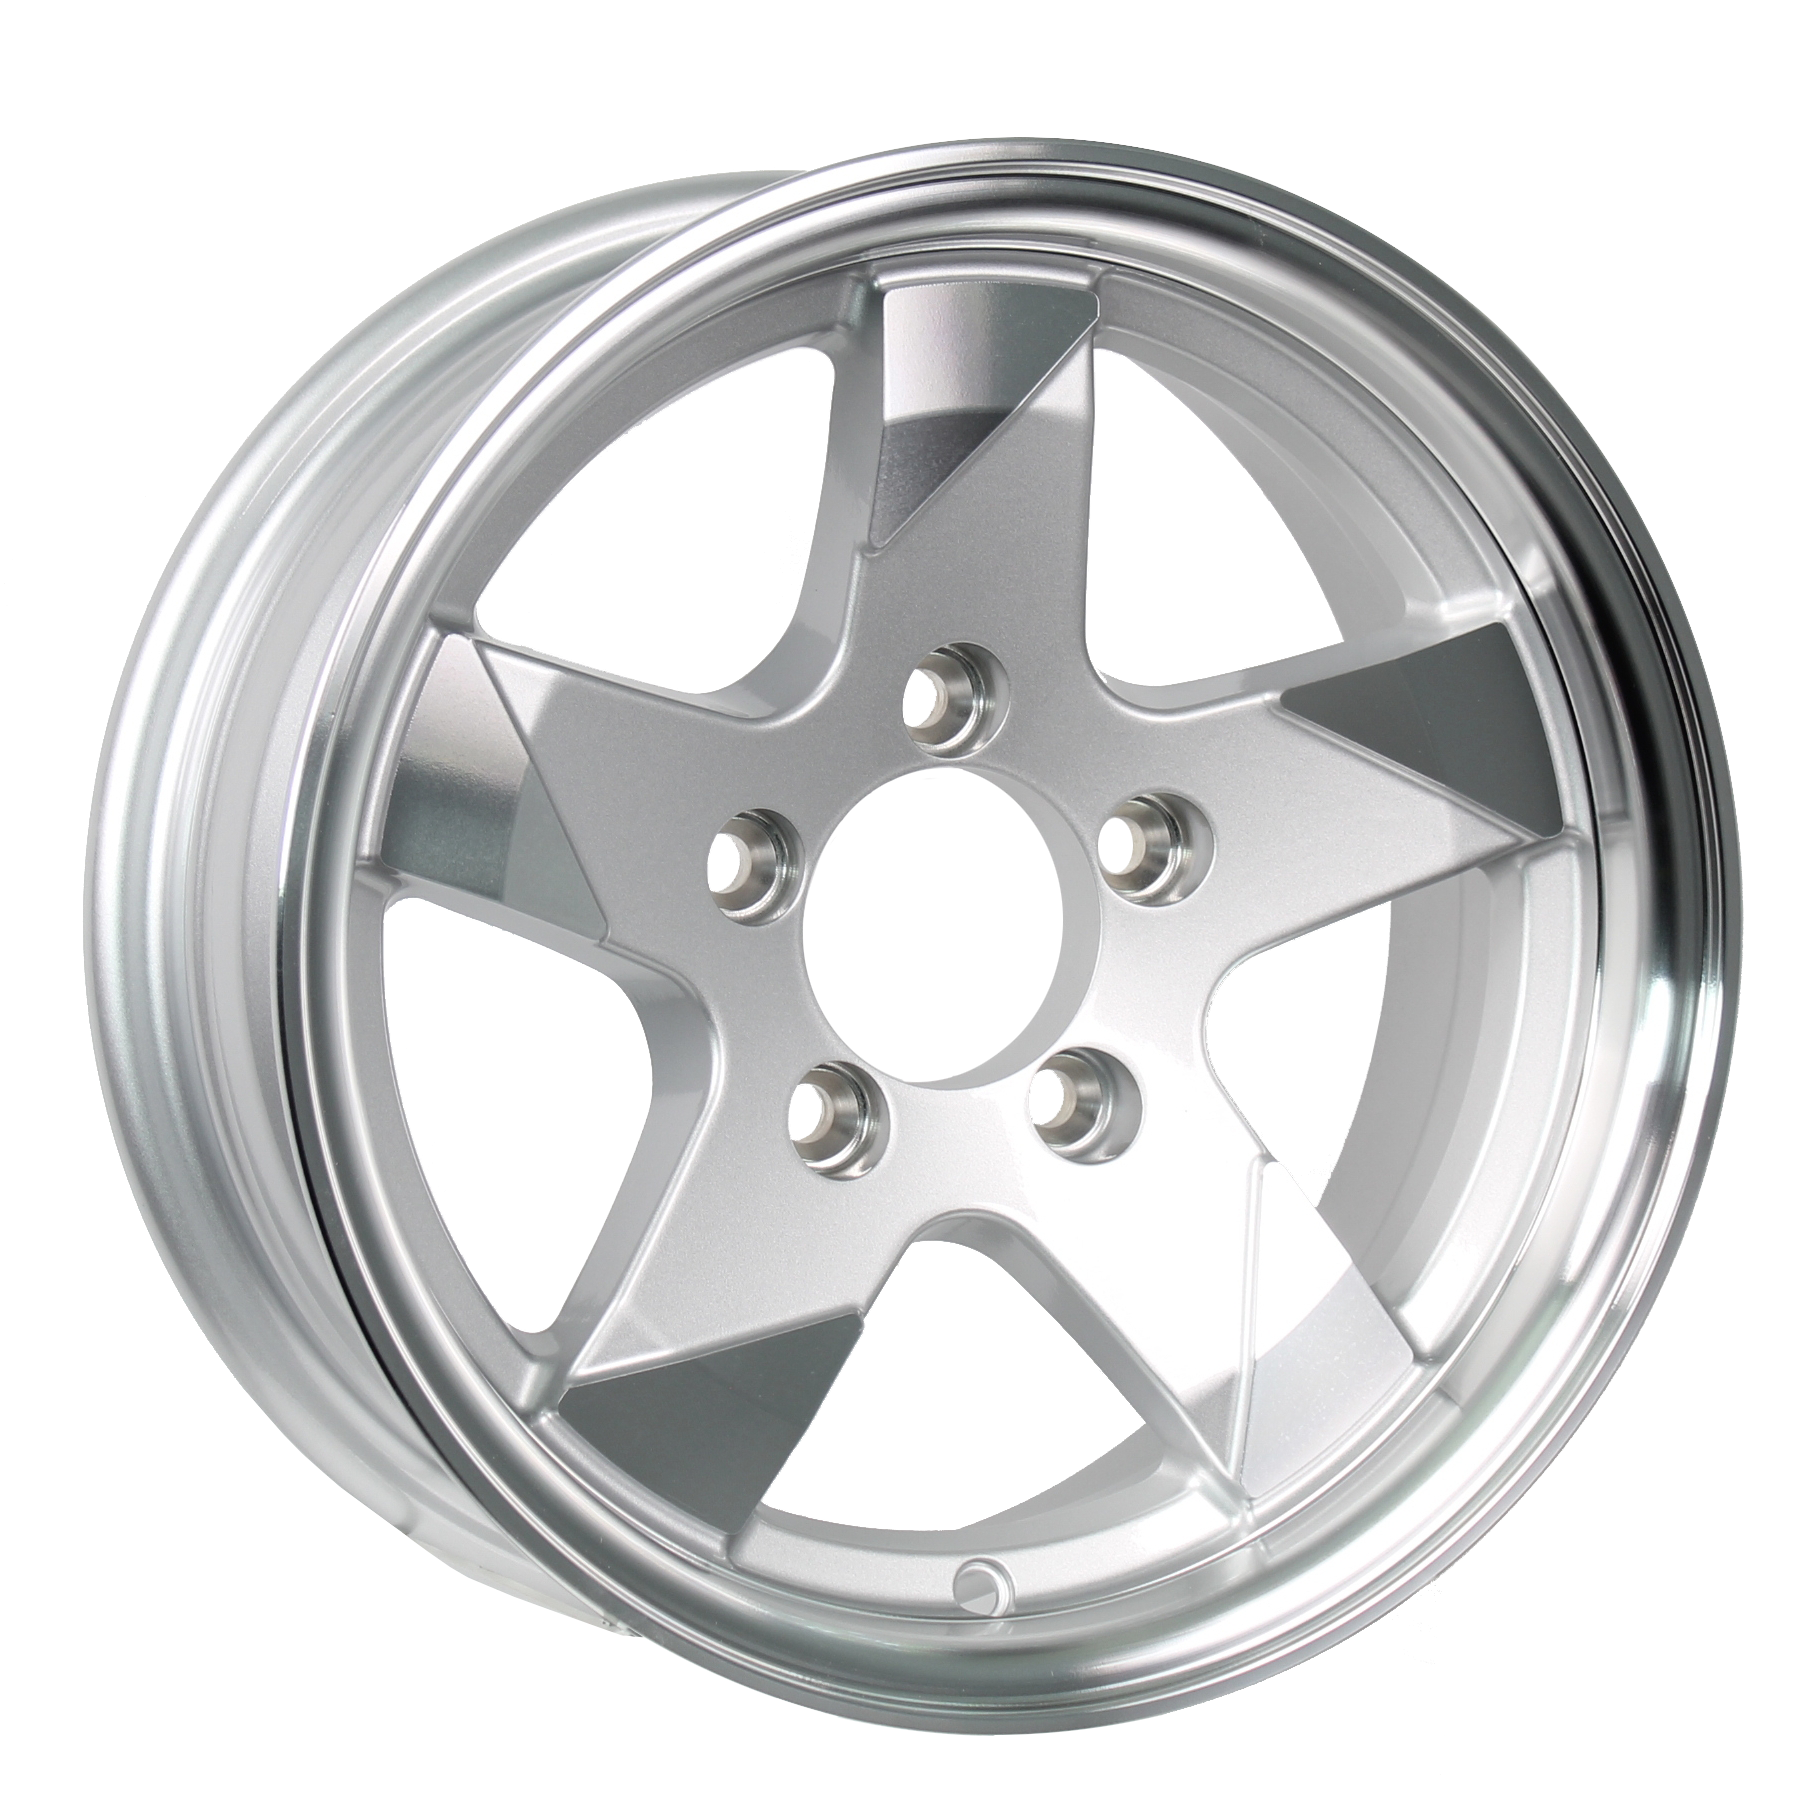 Ascent- 15x5 5-4.5 Silver Aluminum Trailer Wheel  Image